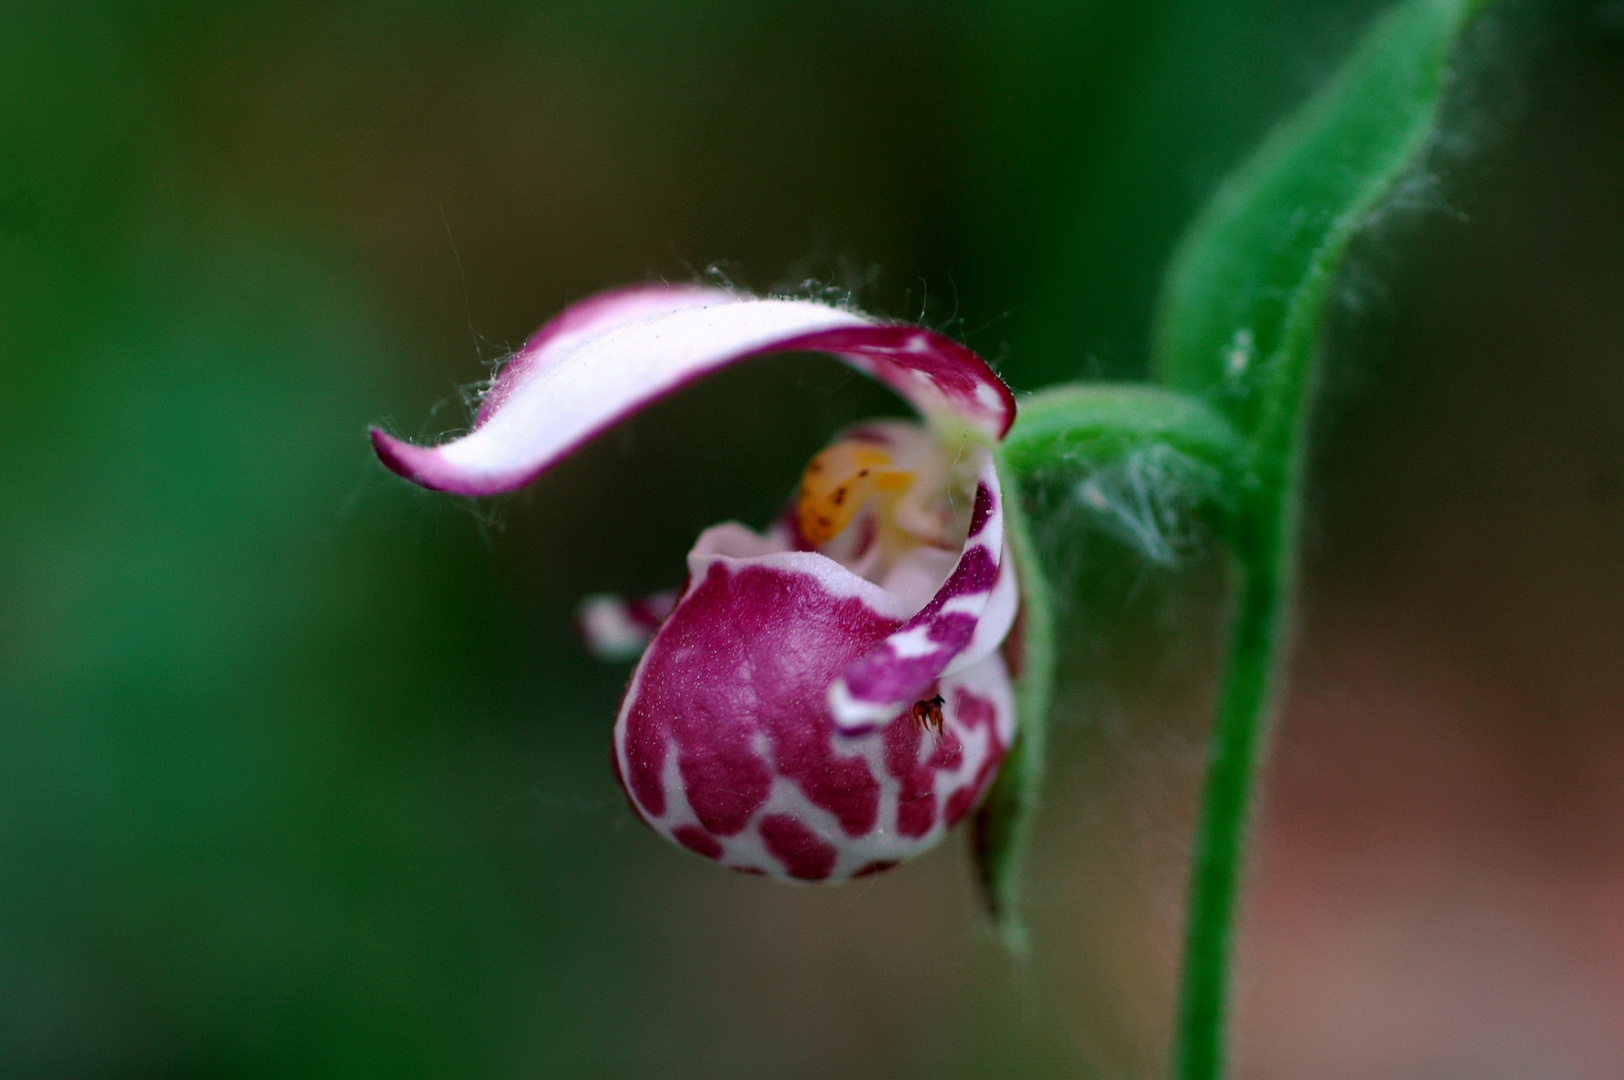 Frauenschuh (Cypripedium guttatum)